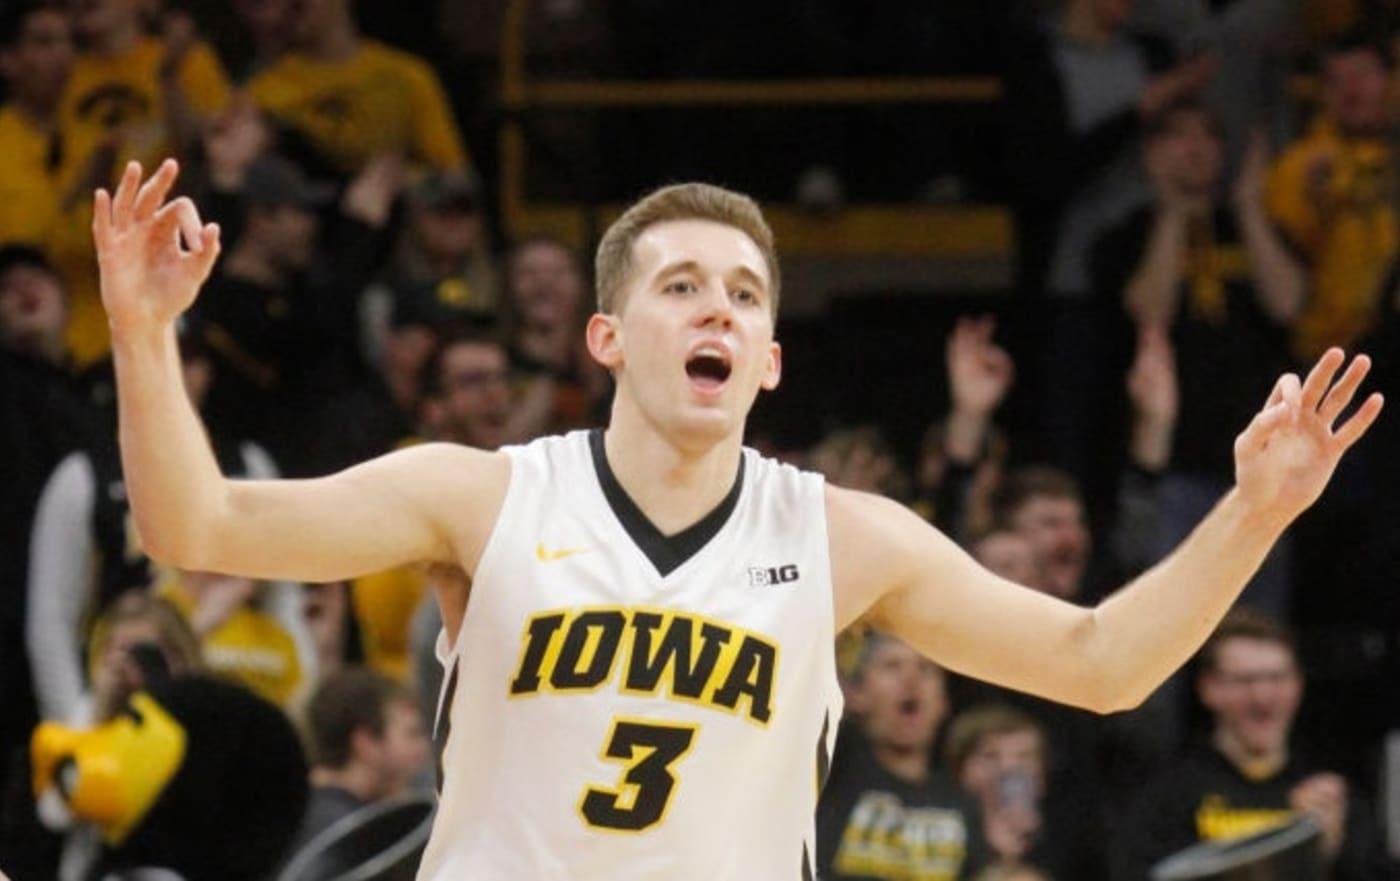 Jordan Bohannon of Iowa